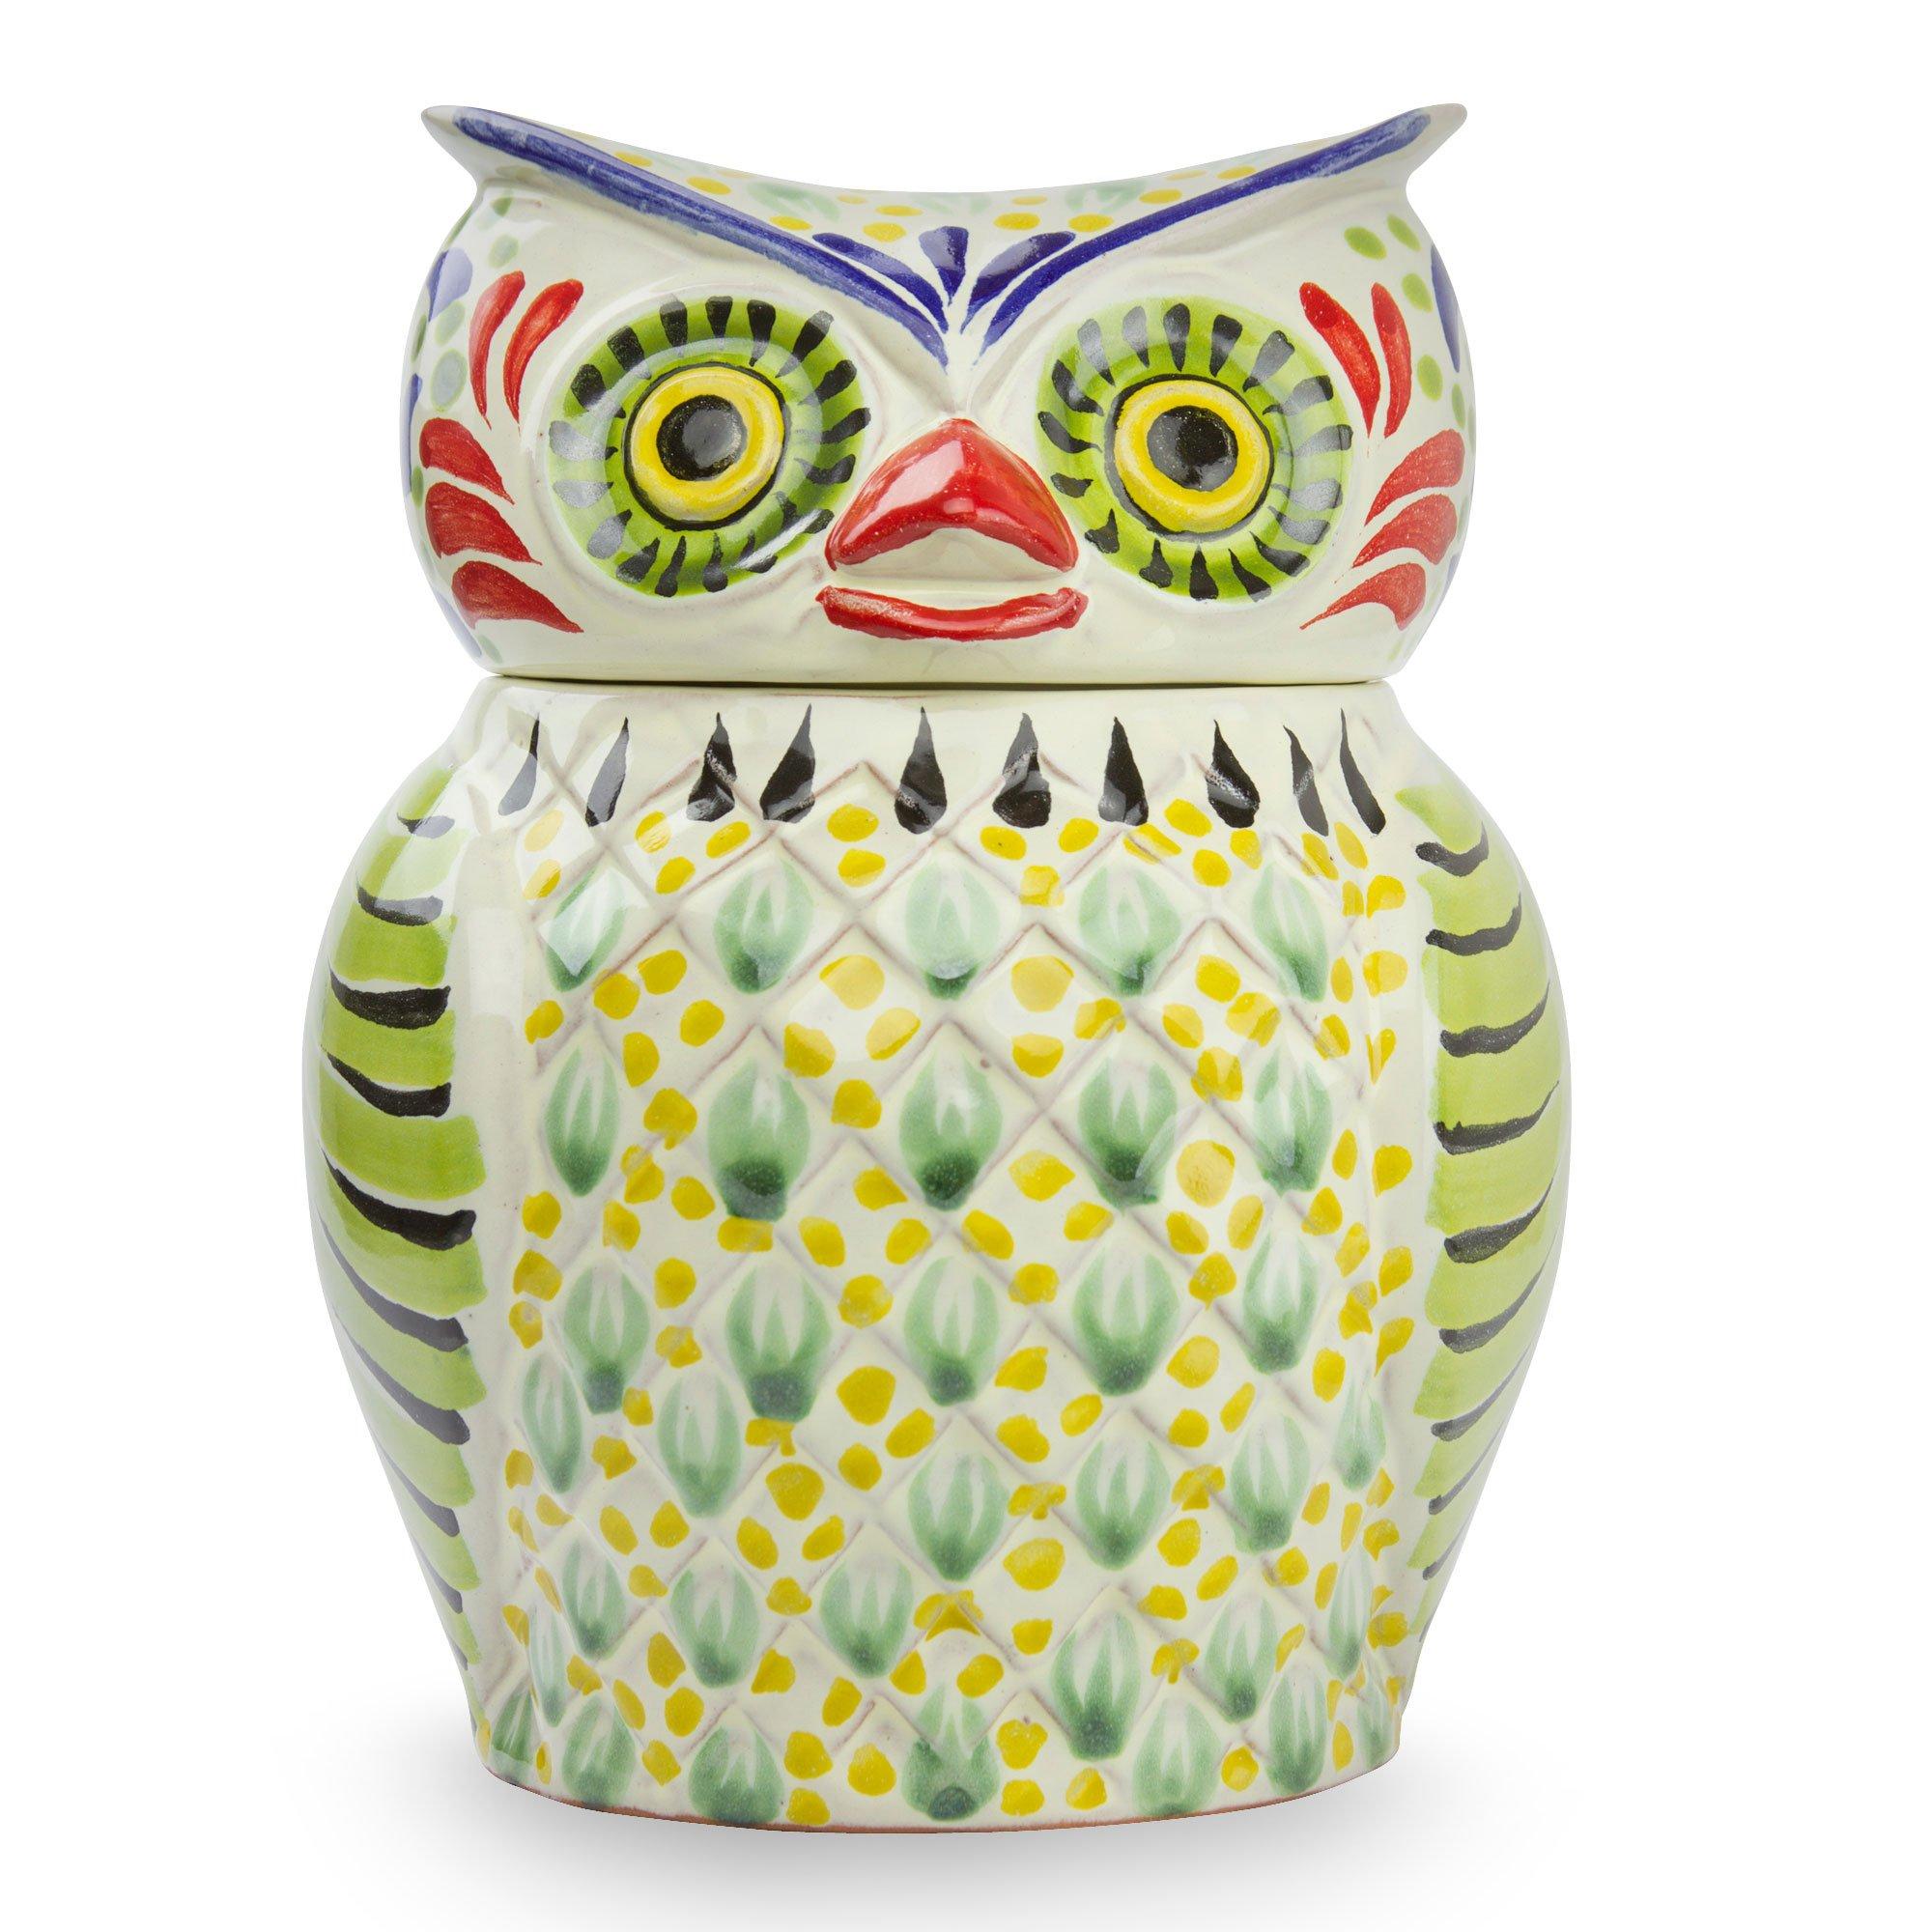 NOVICA Multicolor Ceramic Animal Themed Cookie Jar 'Owl Treats' by NOVICA